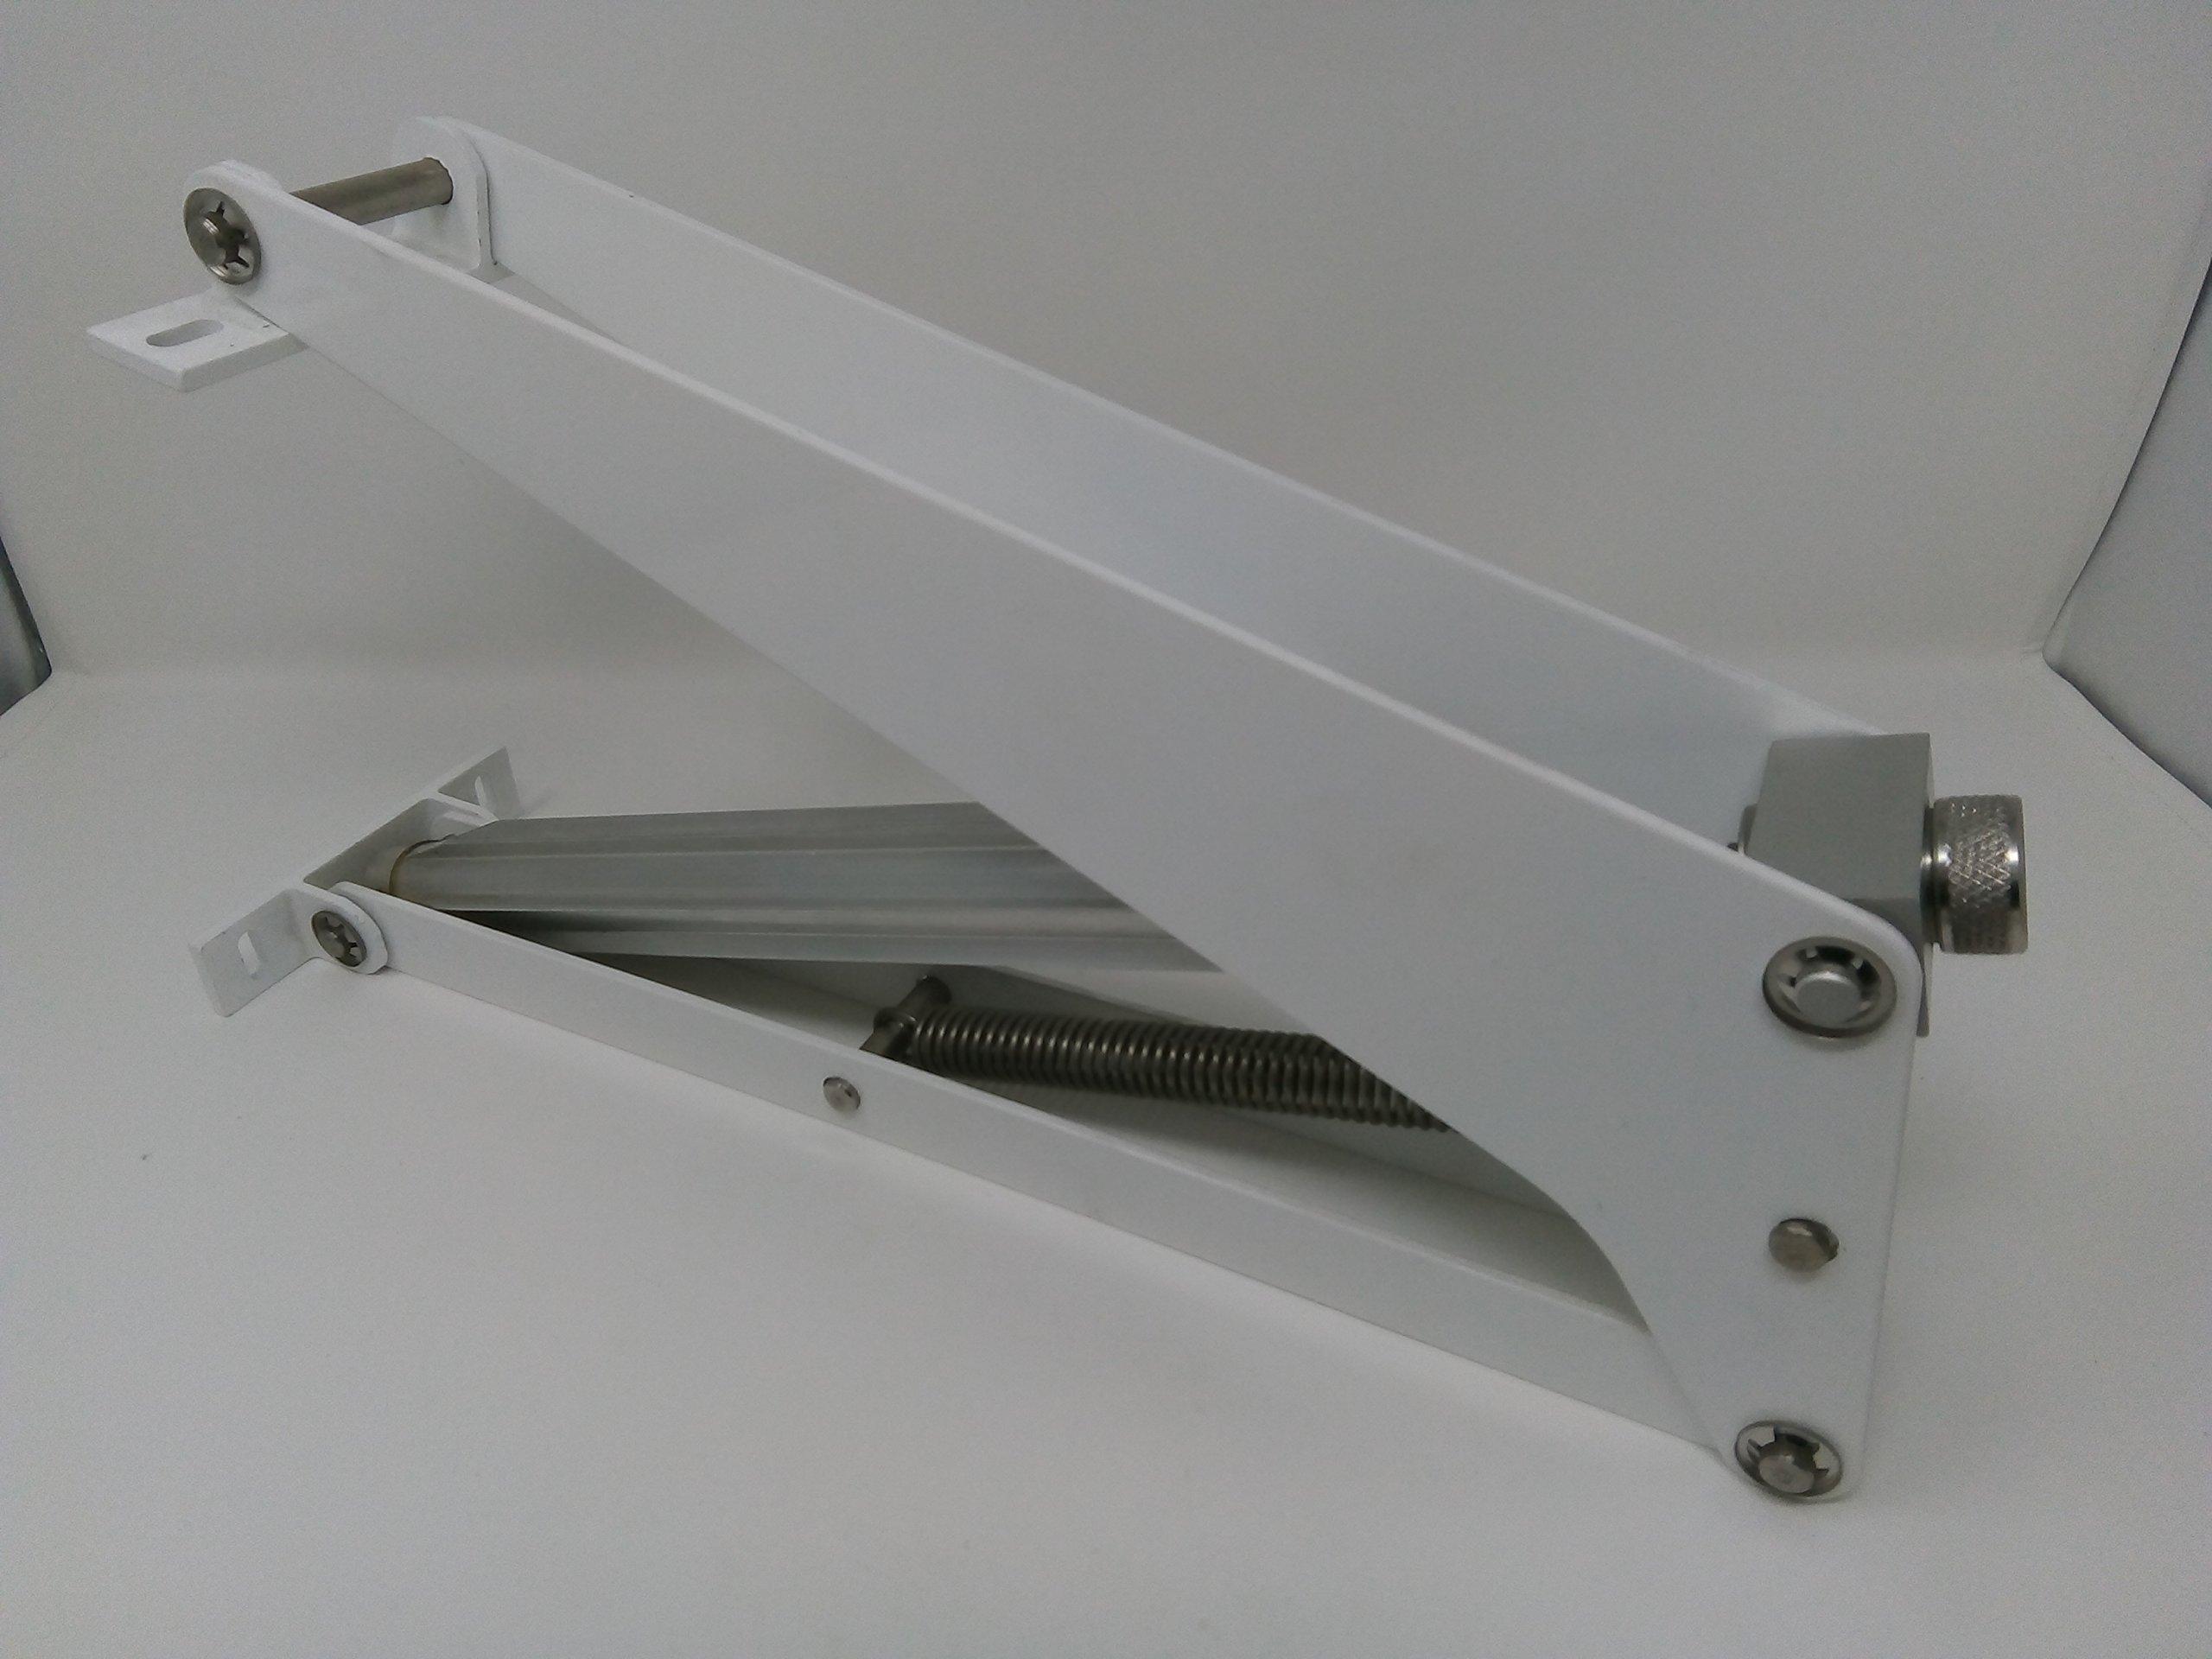 Bayliss MK7 Super Automatic Vent Opener White Finish